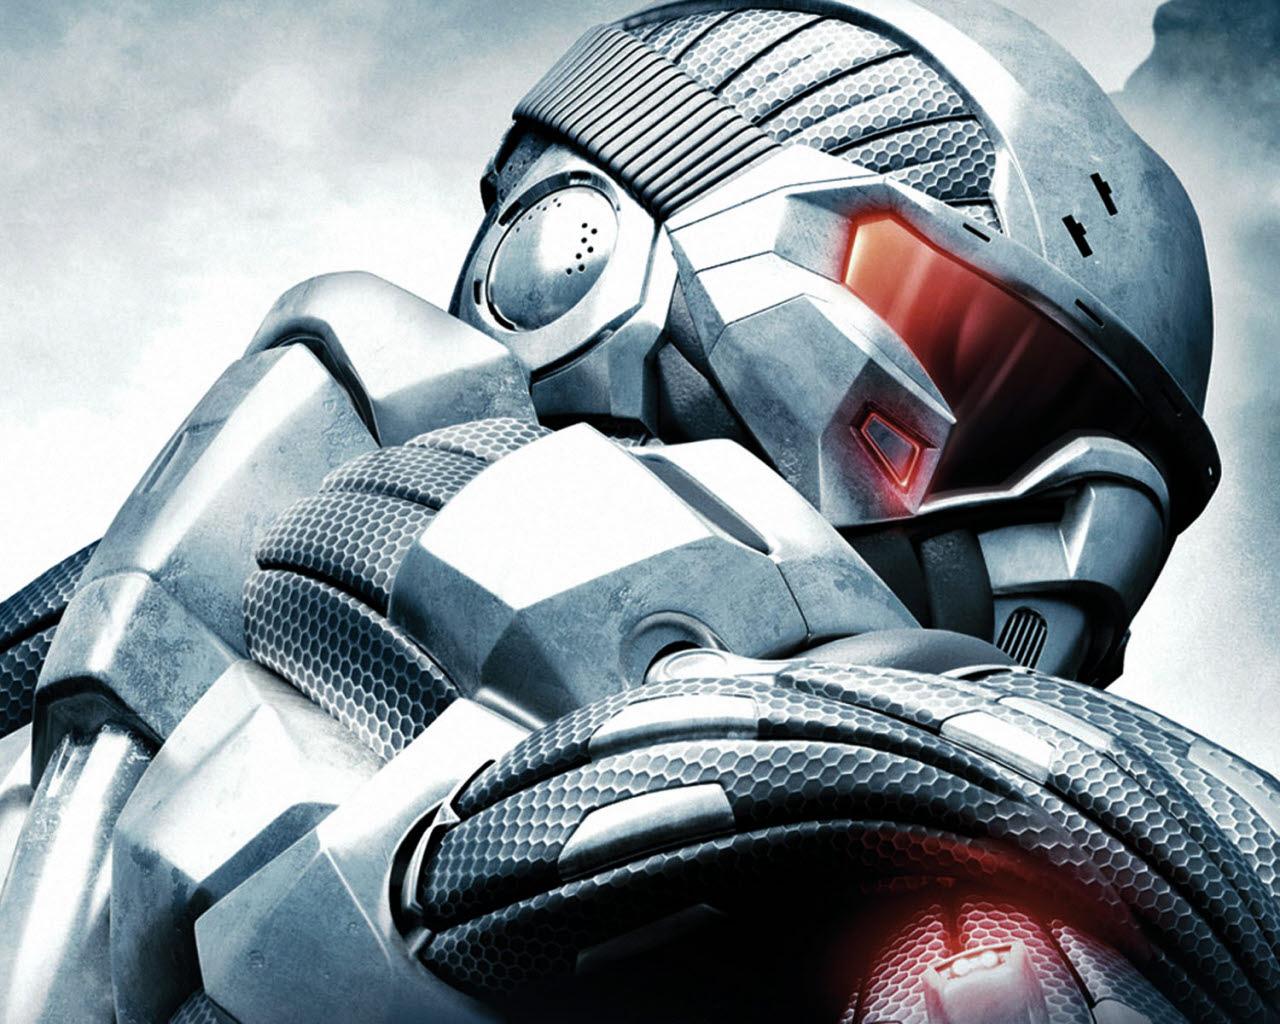 Como texturizar una armadura-crysis_modelar_armadura_3d.jpg